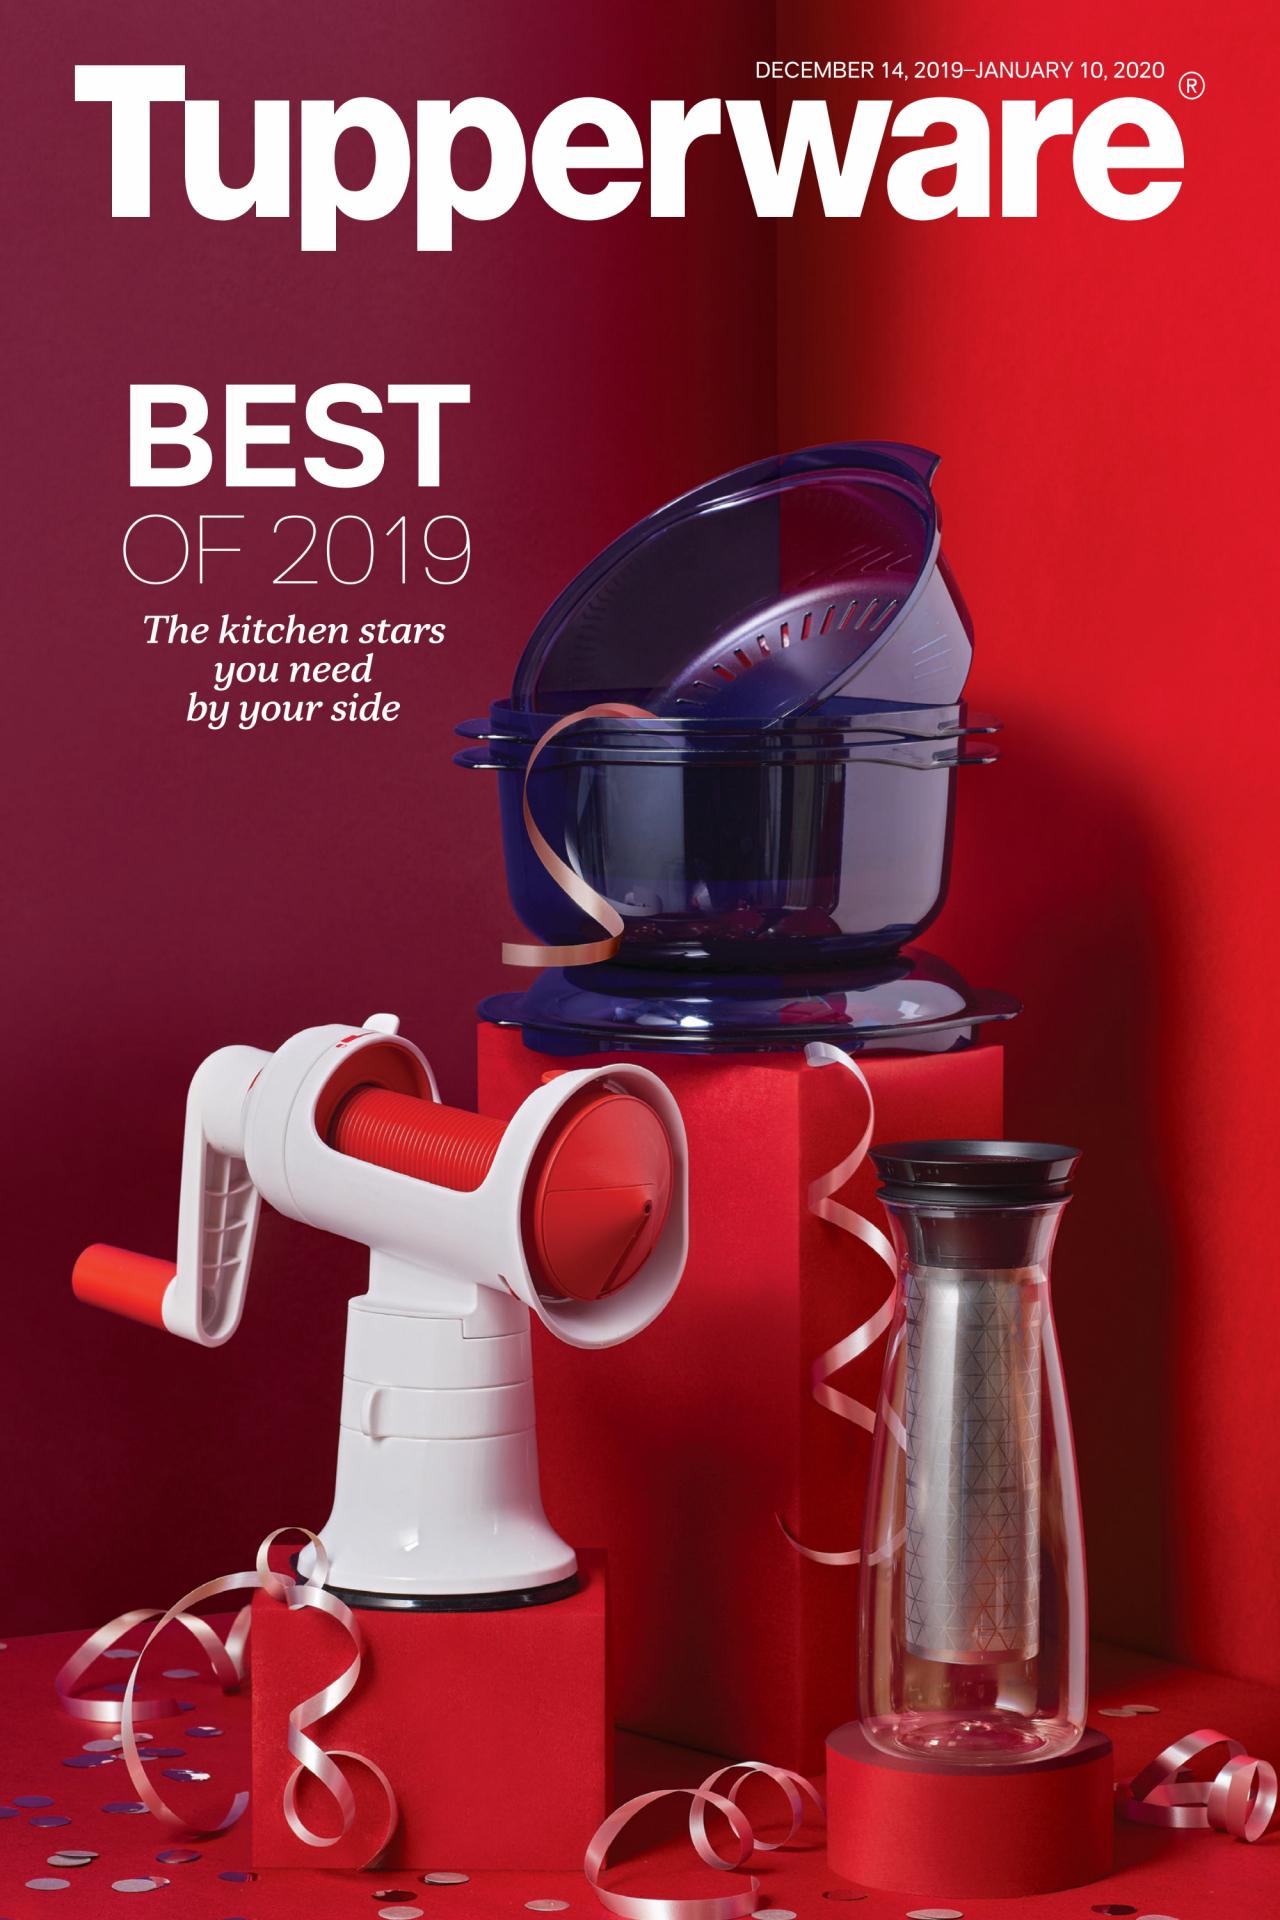 Tupperware Brochure – Valid Dec 14, 2019  Jan 10, 2020 within Tupperware Januar 2020